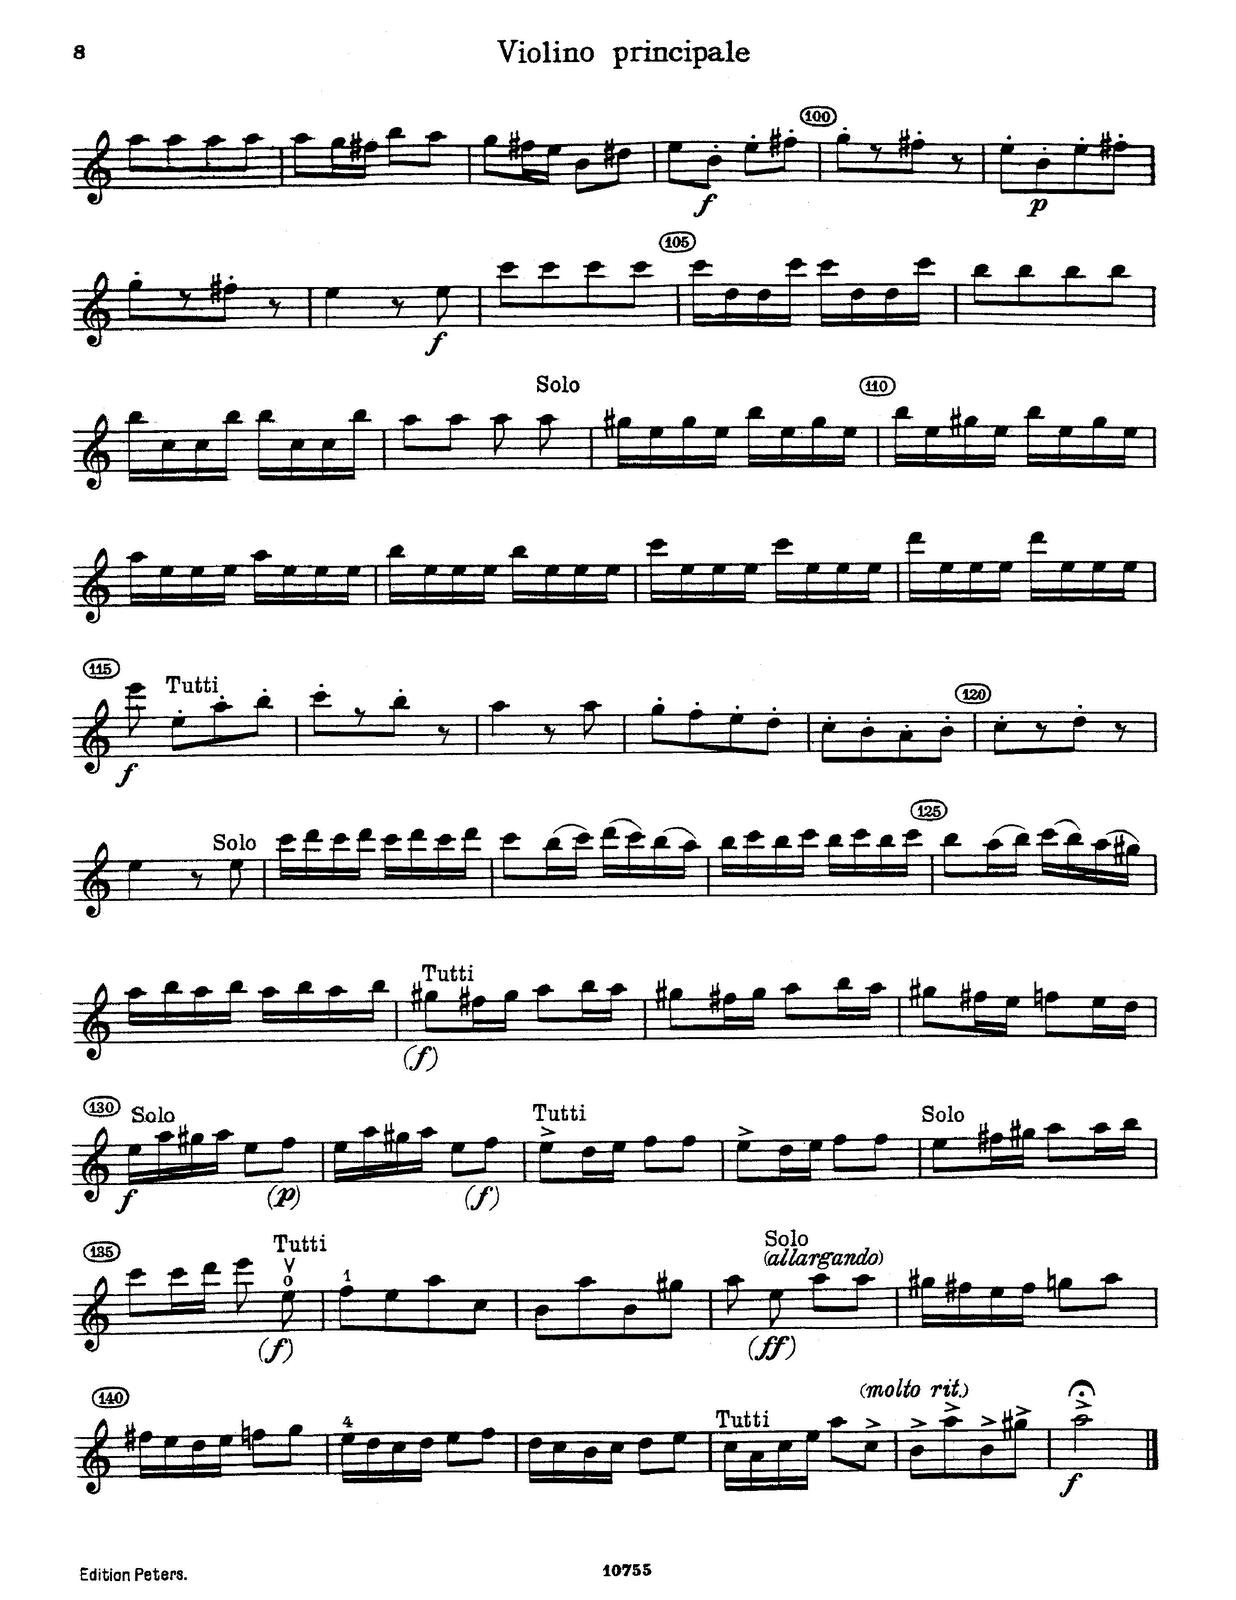 violine principale ViVaLDi